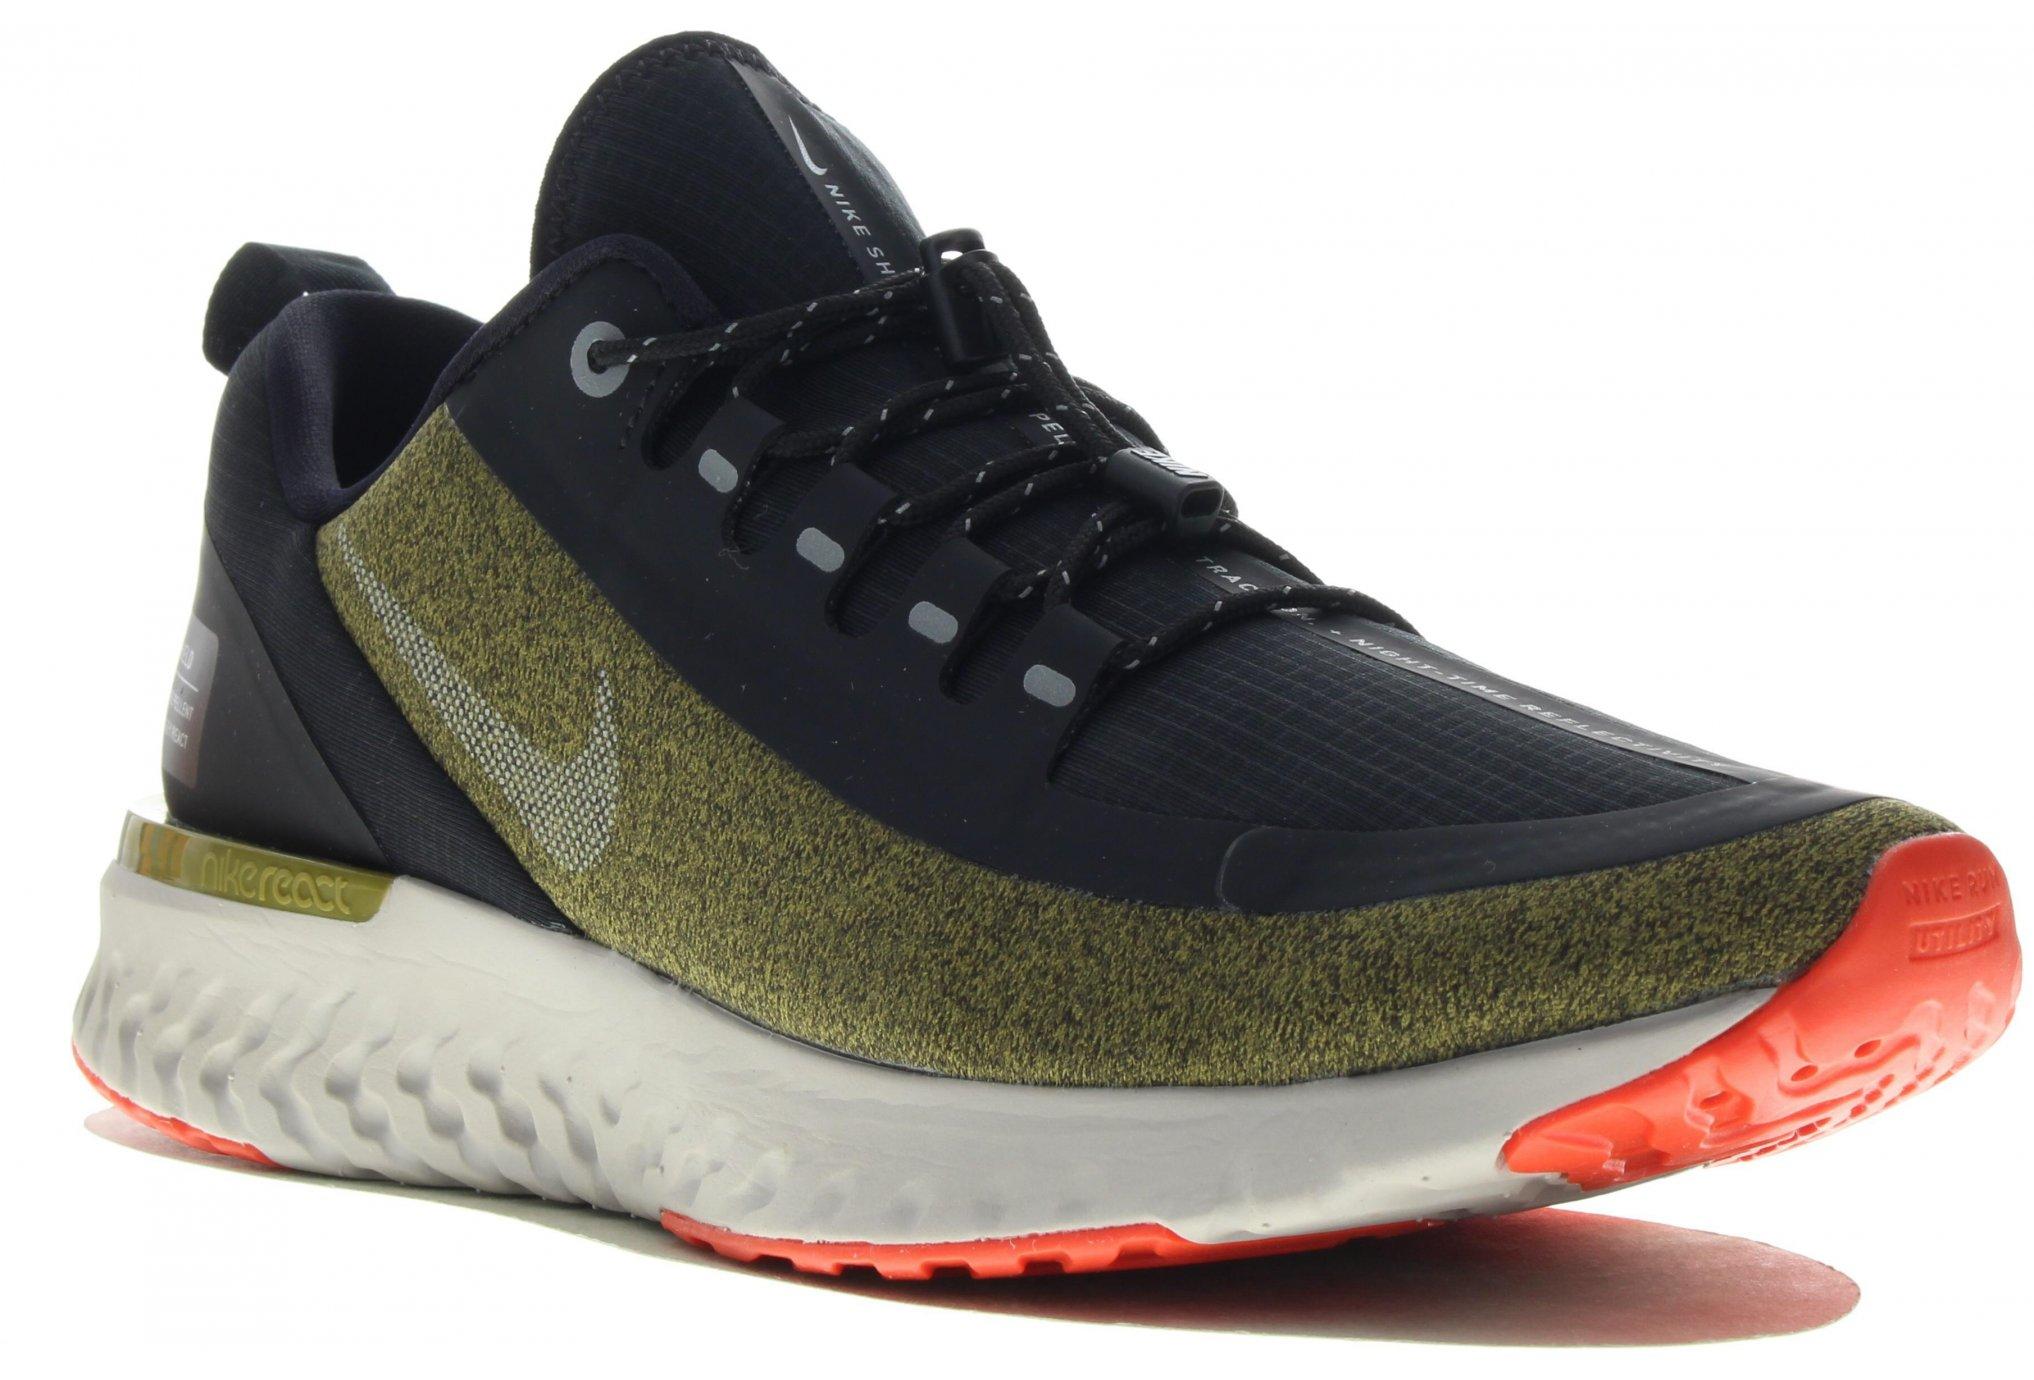 Precios de Nike Odyssey React Shield talla 46 baratas